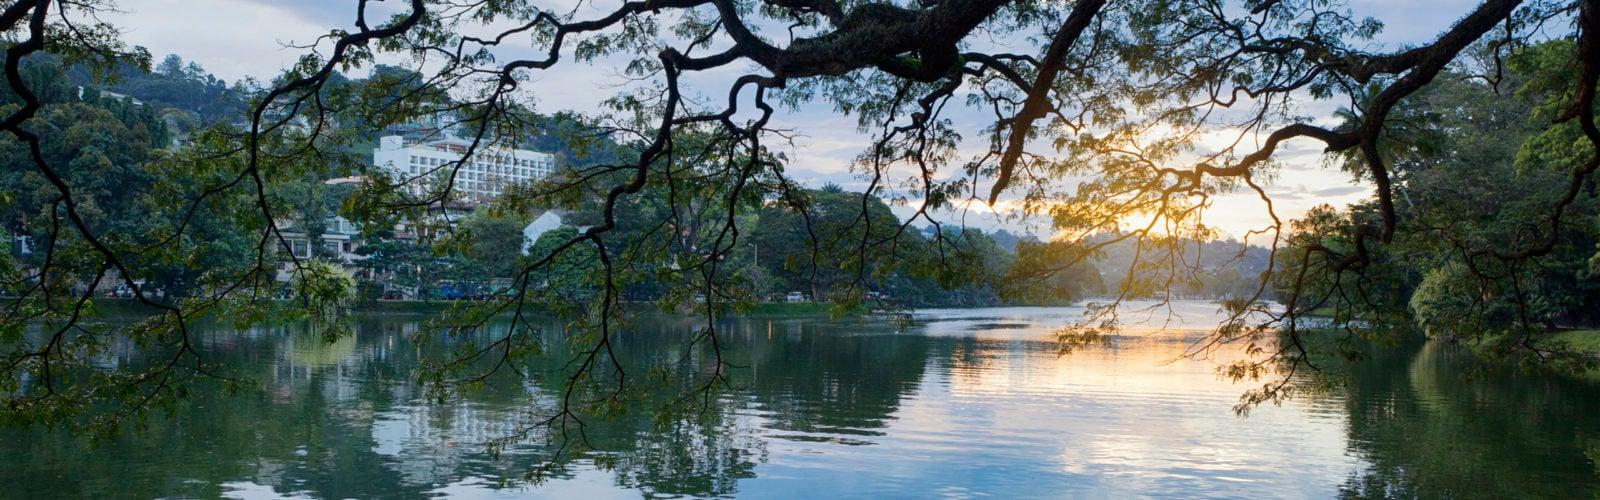 kandy-lake